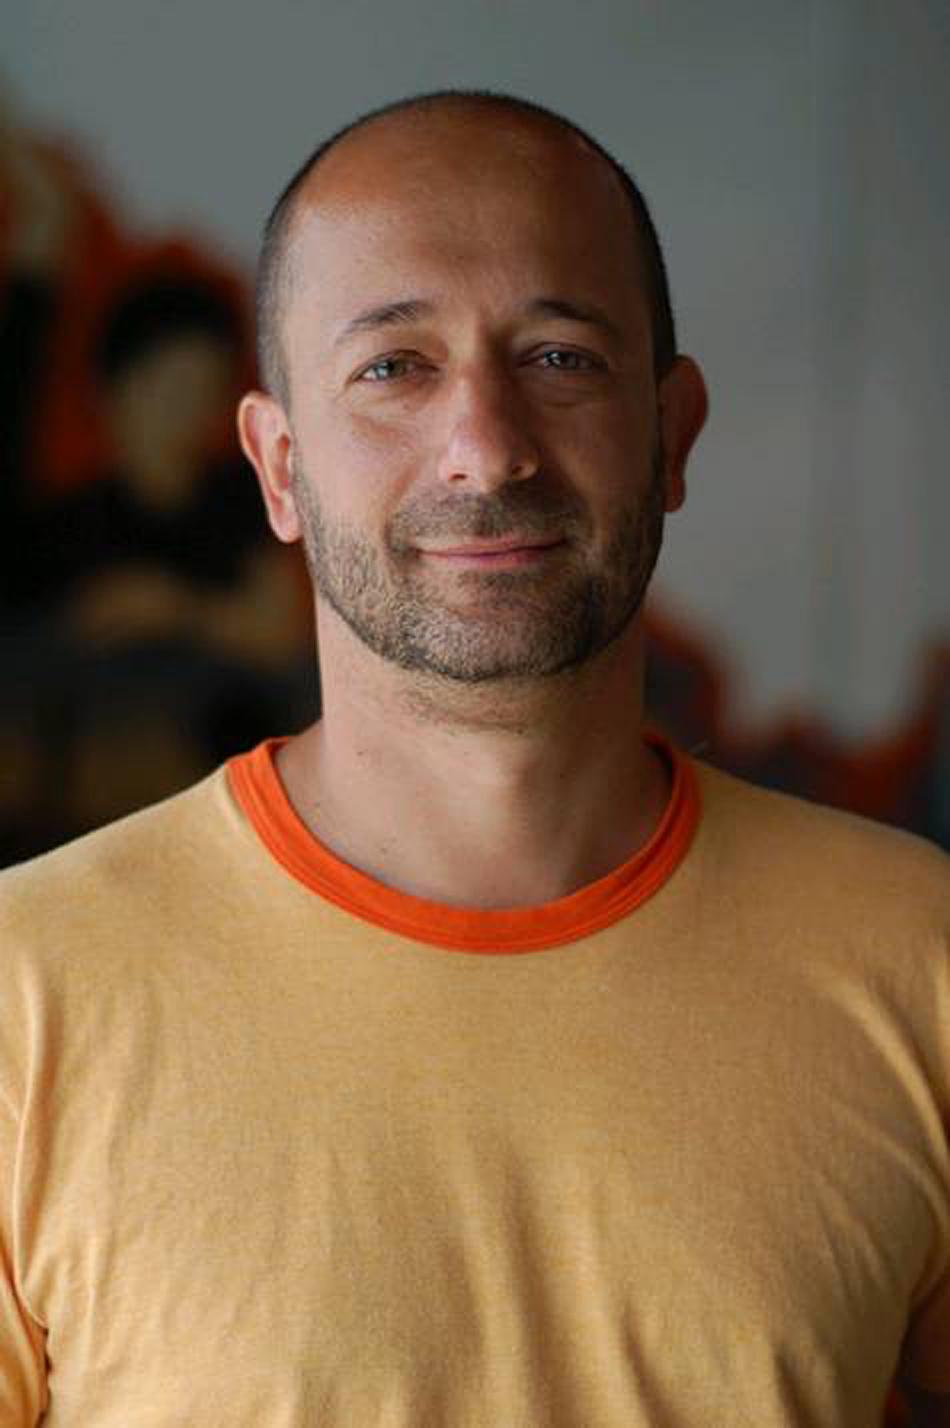 MOG founder and CEO David Hyman